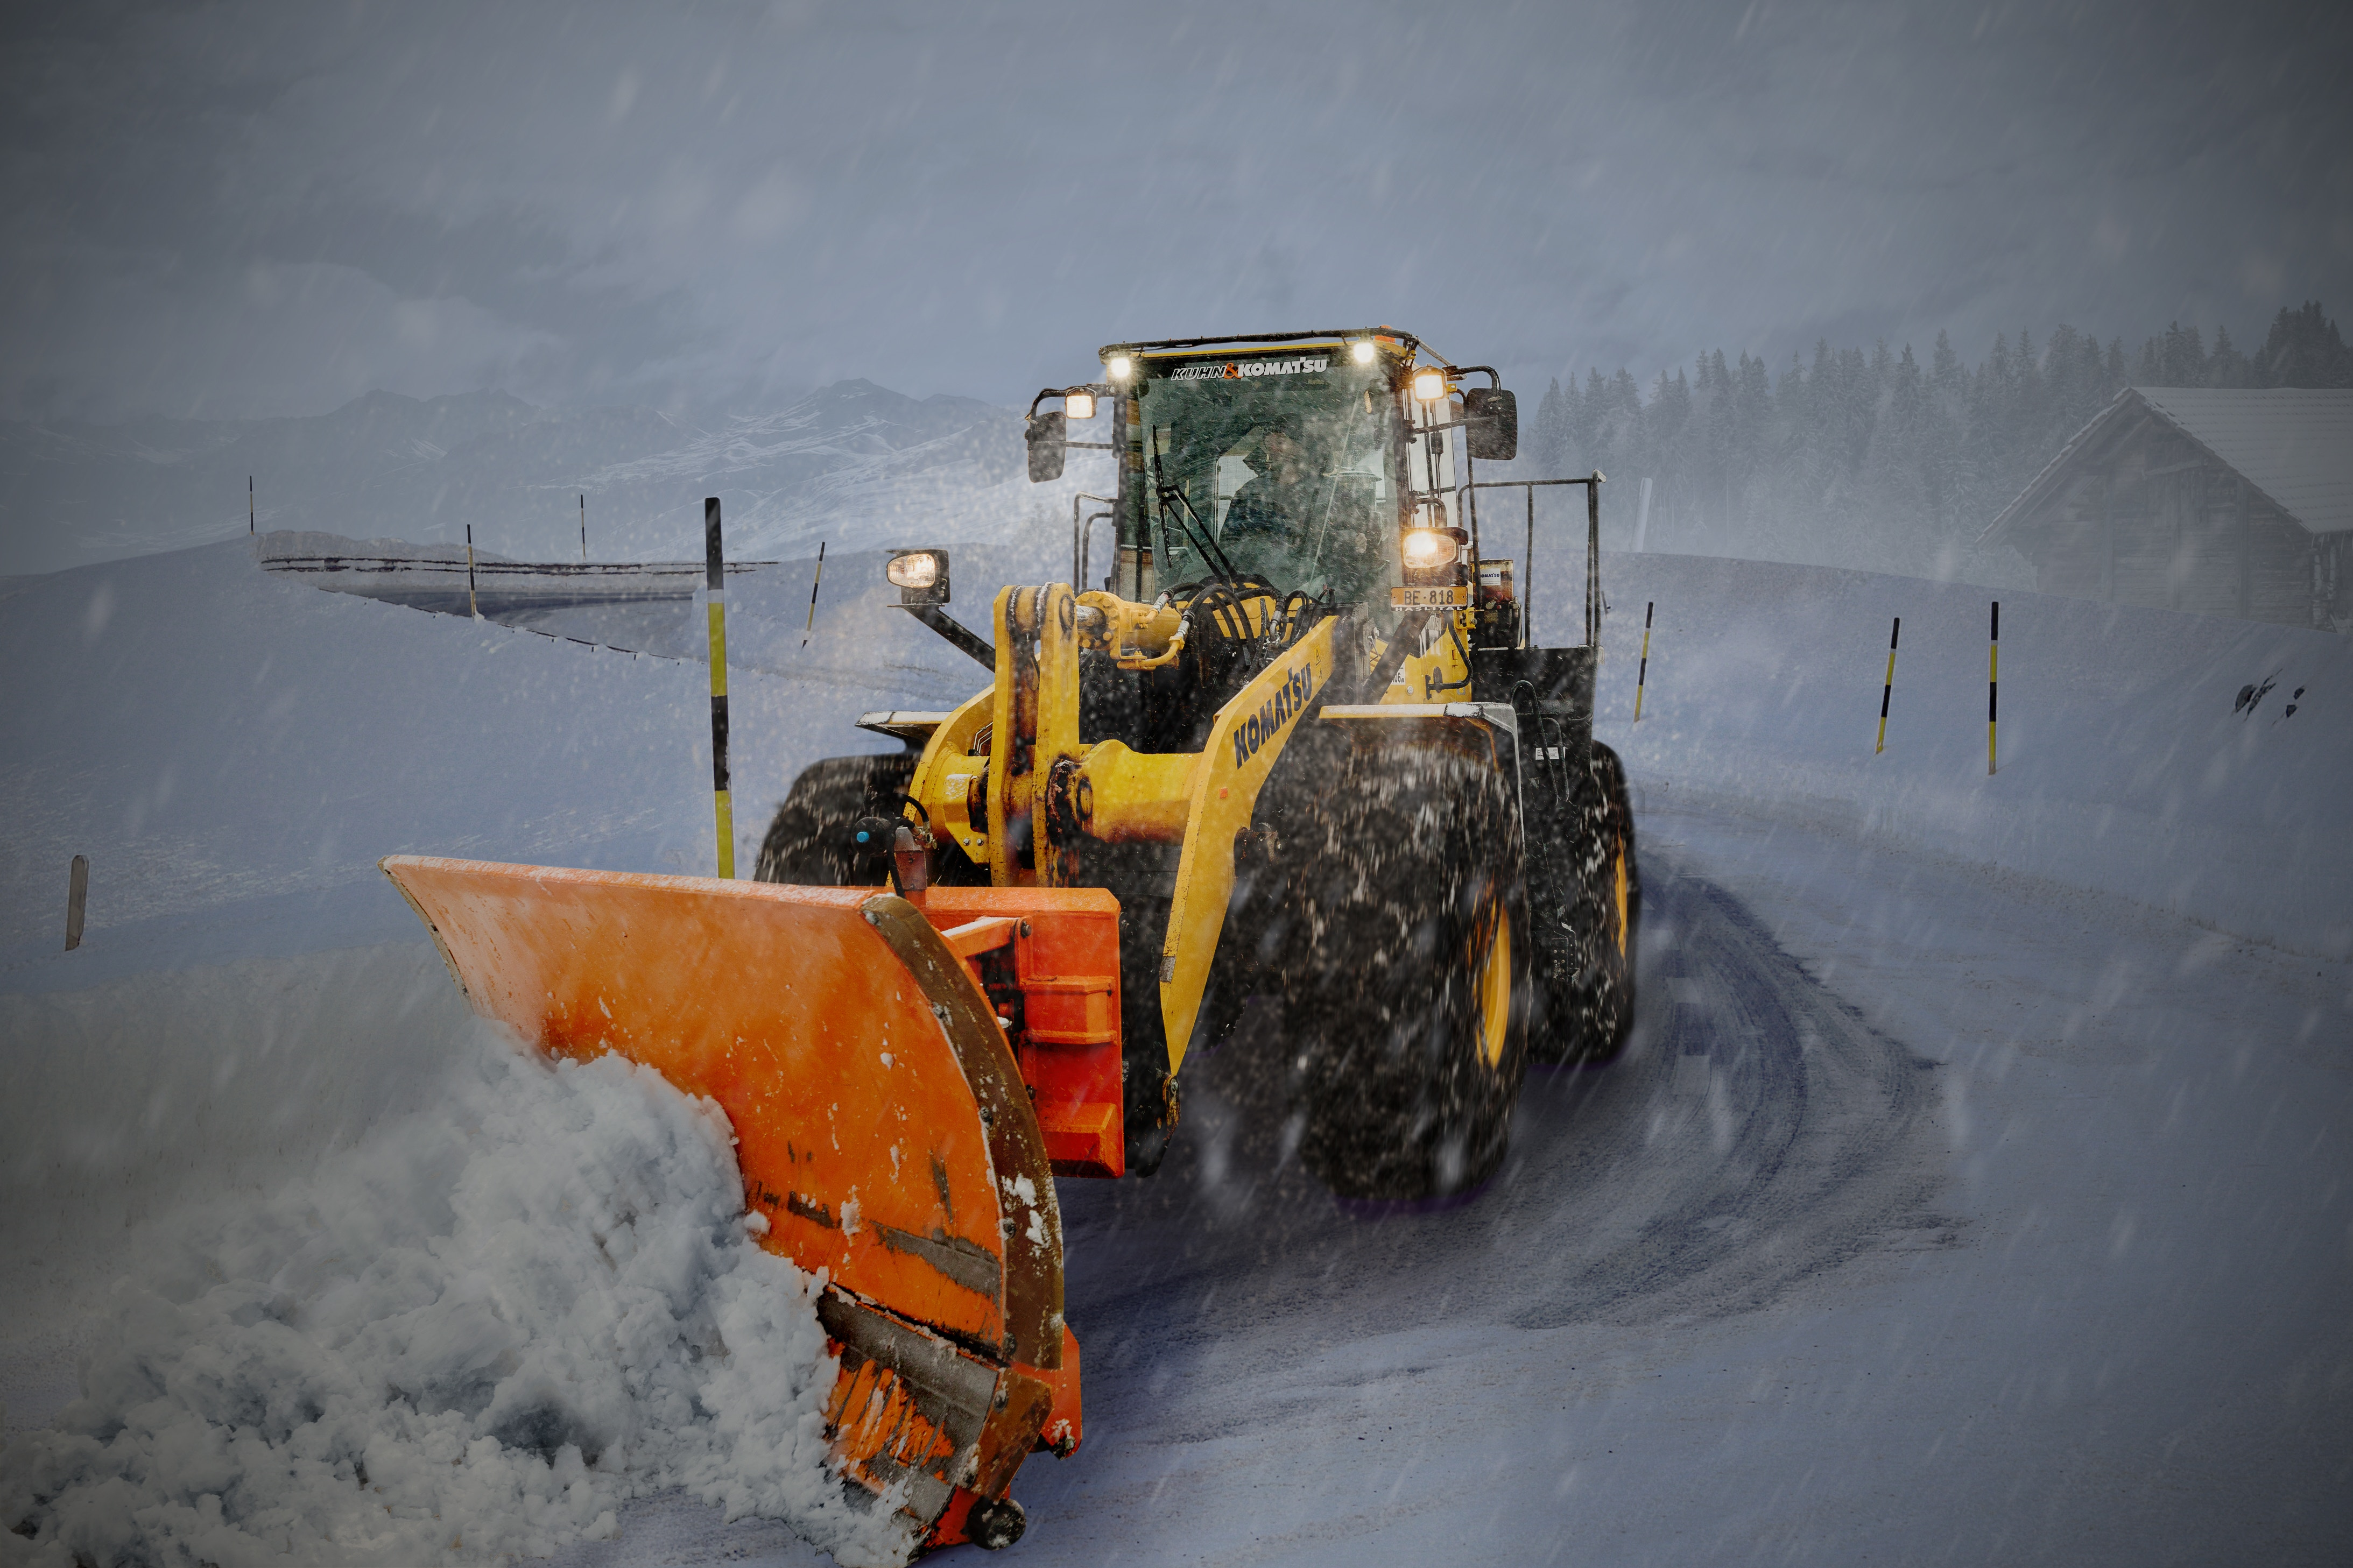 snow plough in snow